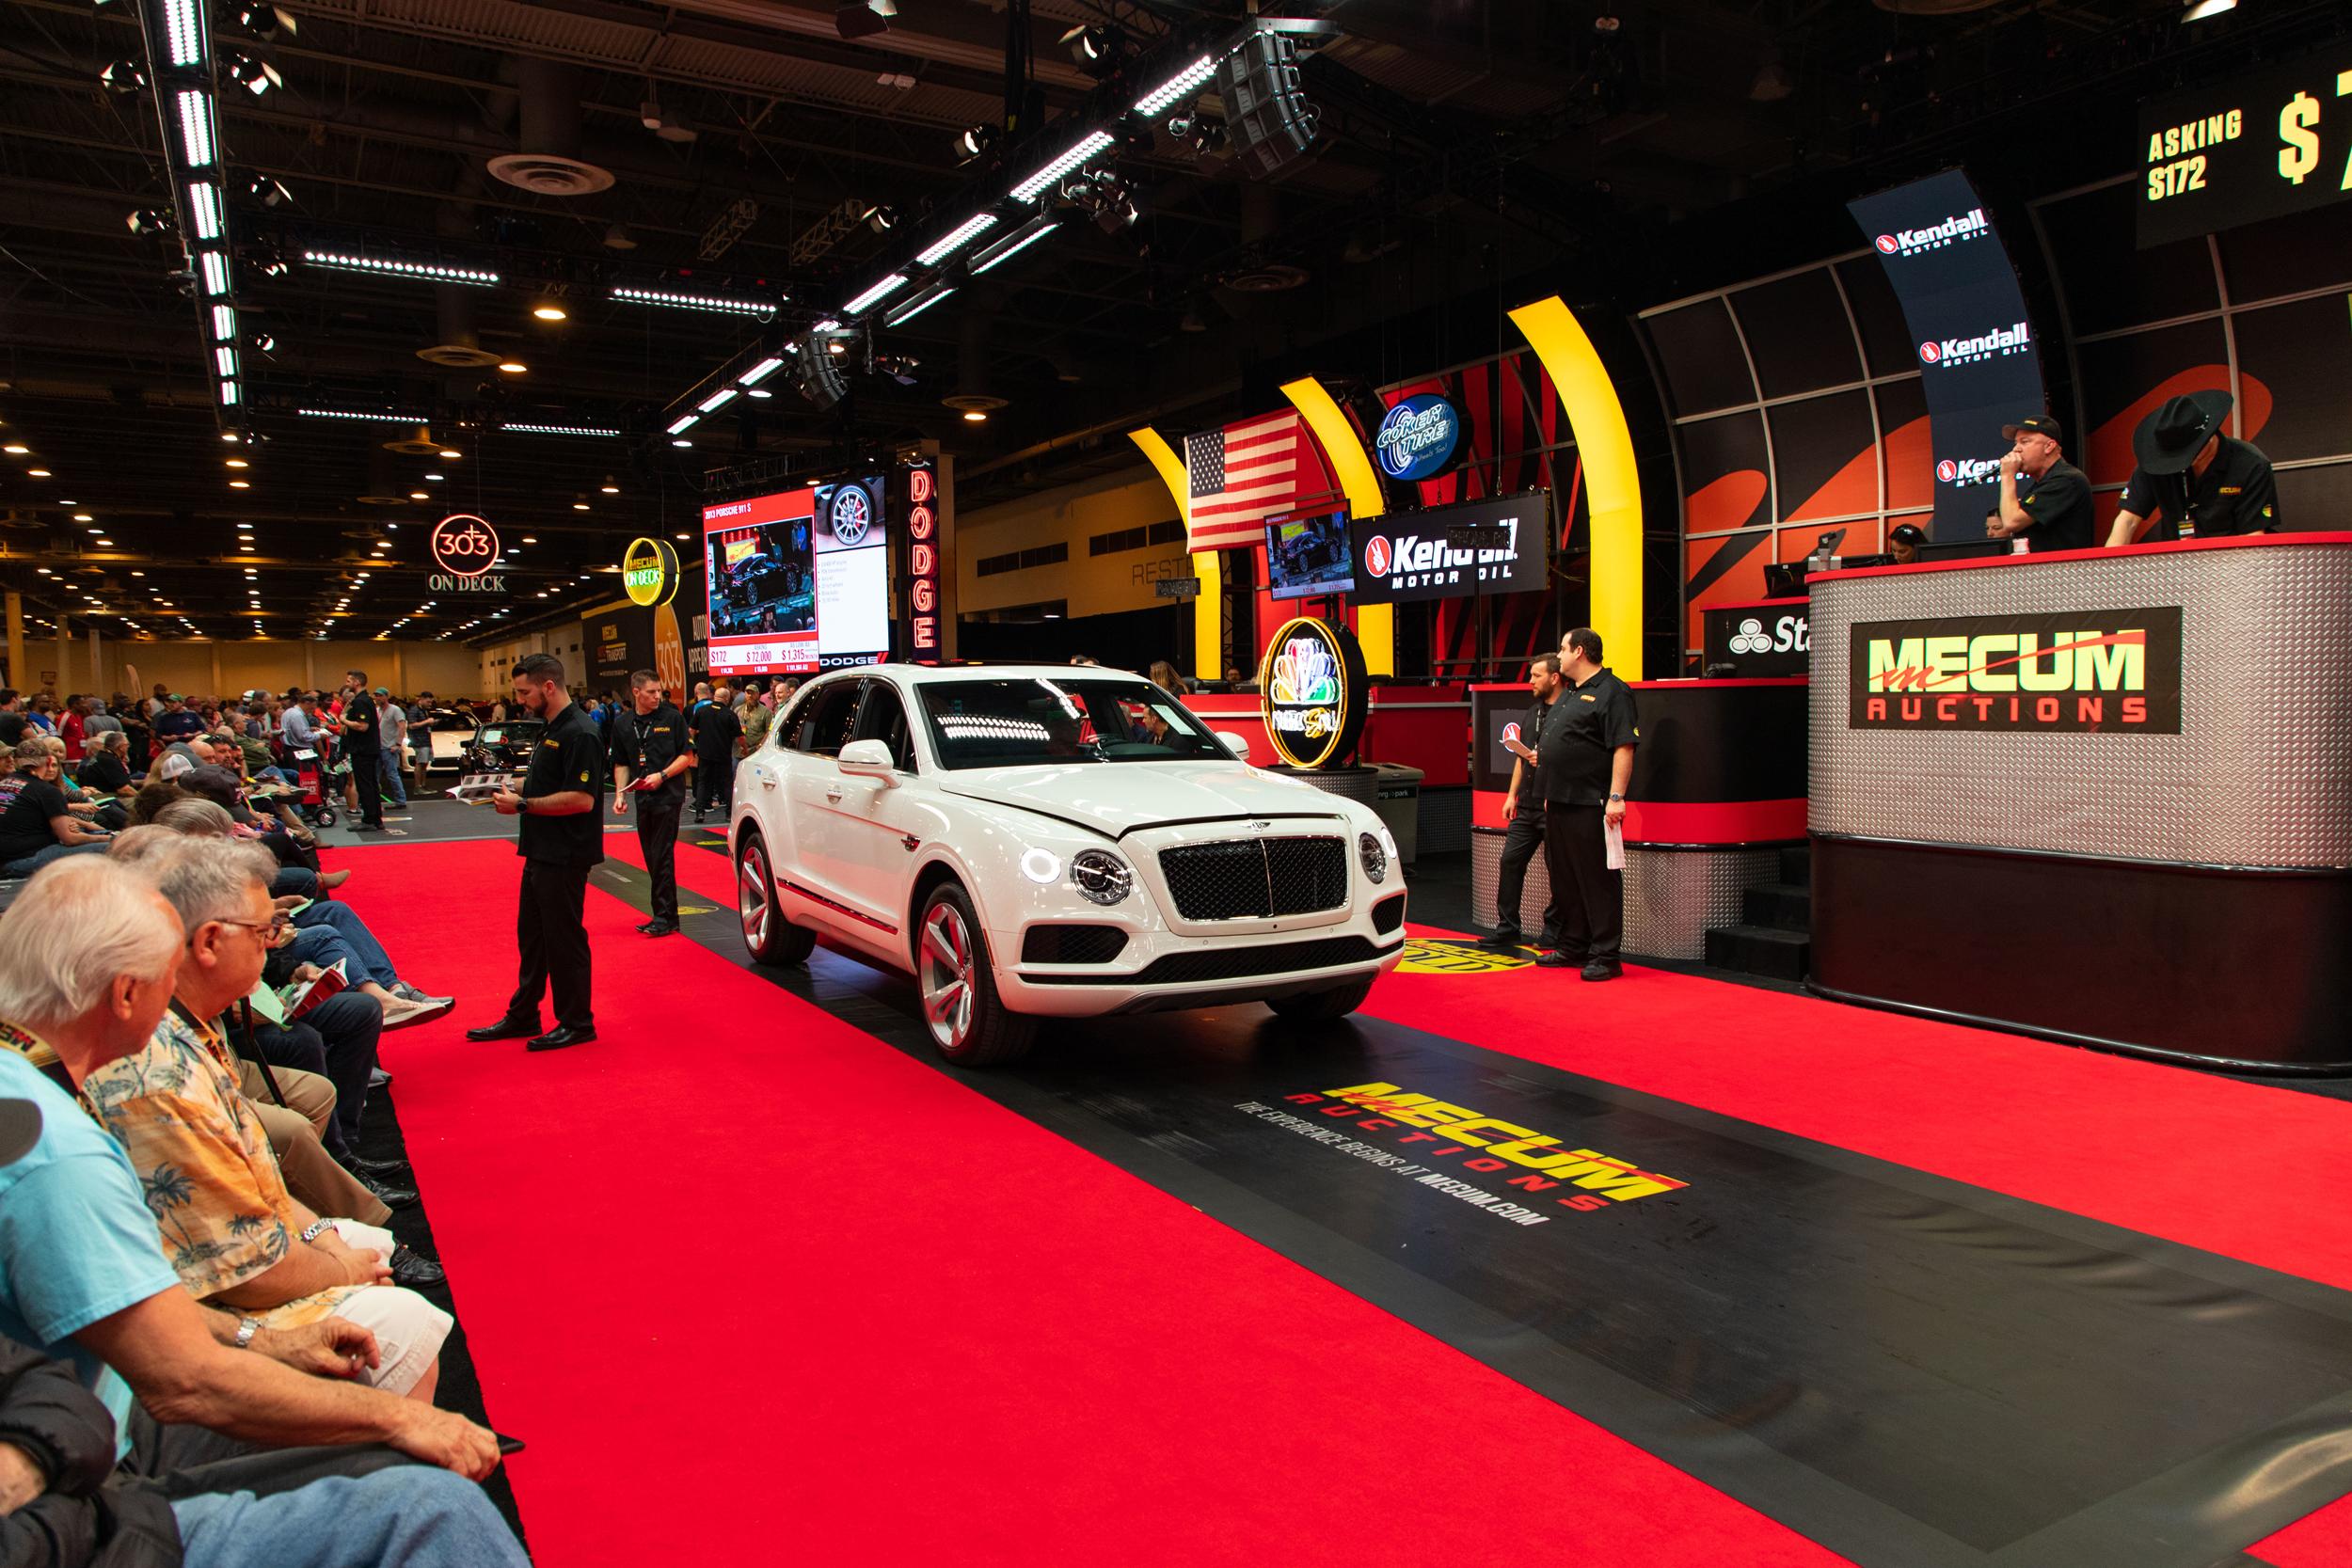 2019 Bentley Bentayga (Lot S172.1) Sells at $187,000 - Mecum Houston 2019